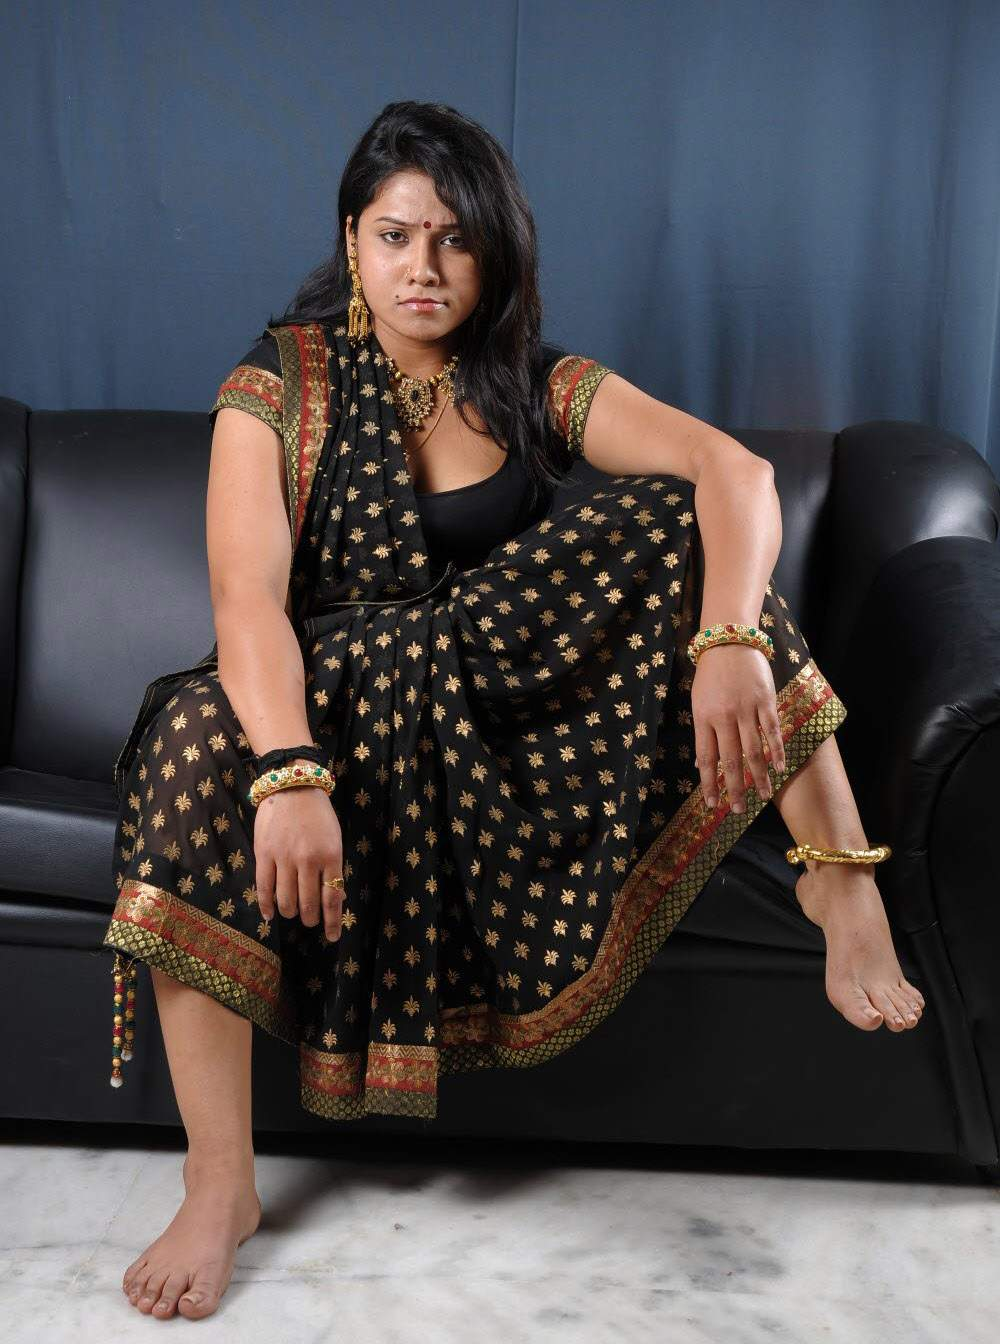 Jyothi 3d Wallpapers Gallery Funda Tollywood Actress Jyothi Hot In Black Saree